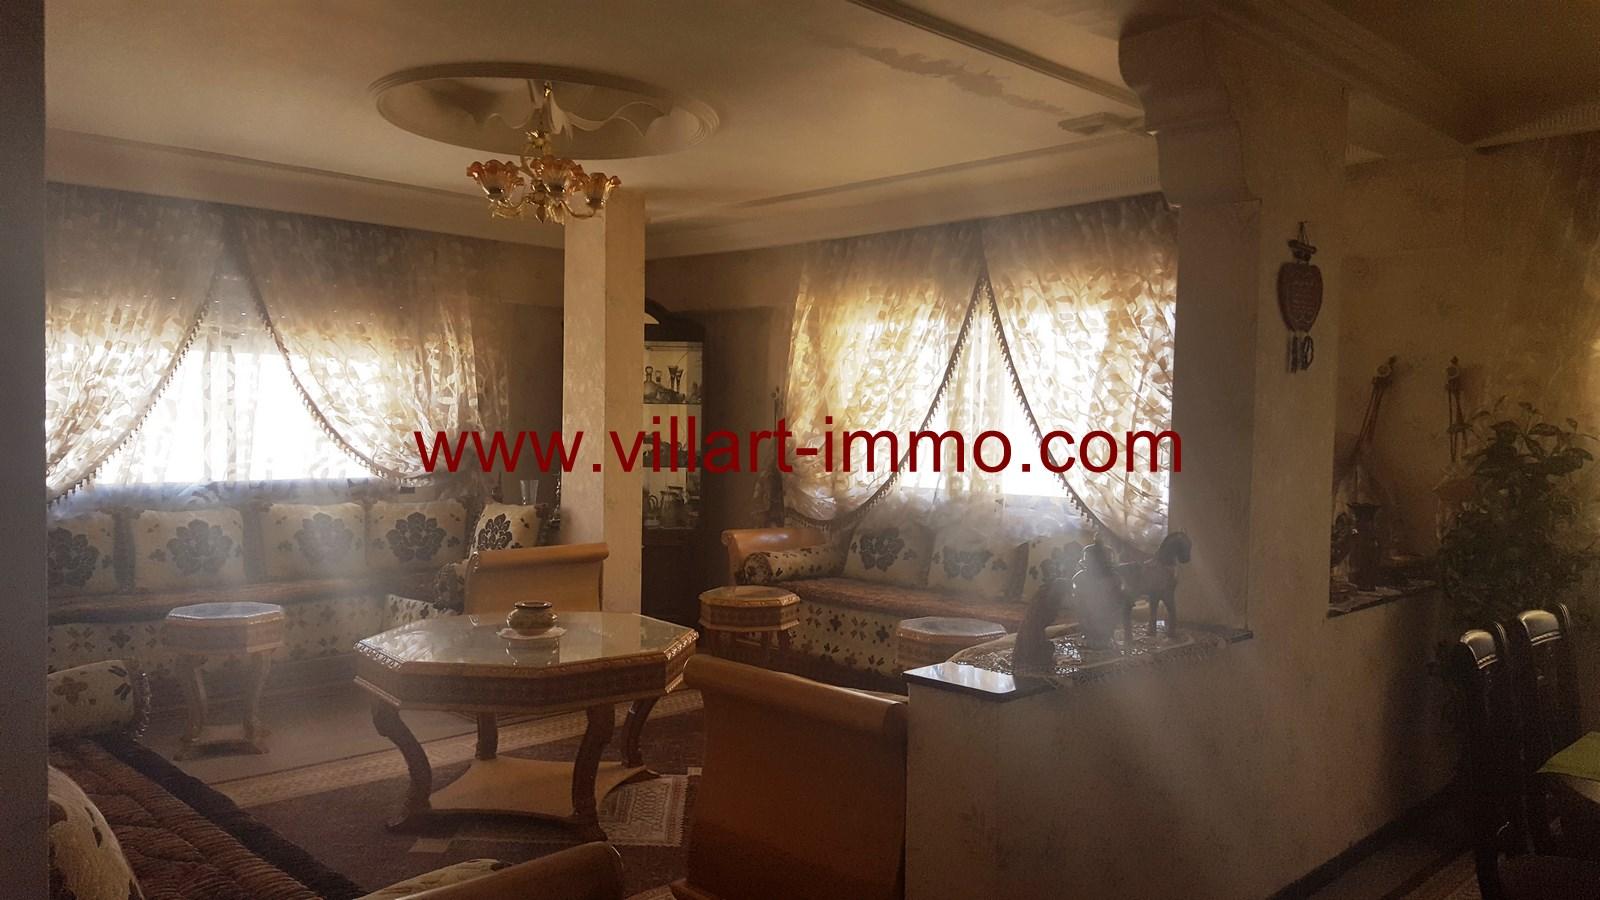 1-a-vendre-appartement-tanger-centre-ville-salon-va429-villart-immo